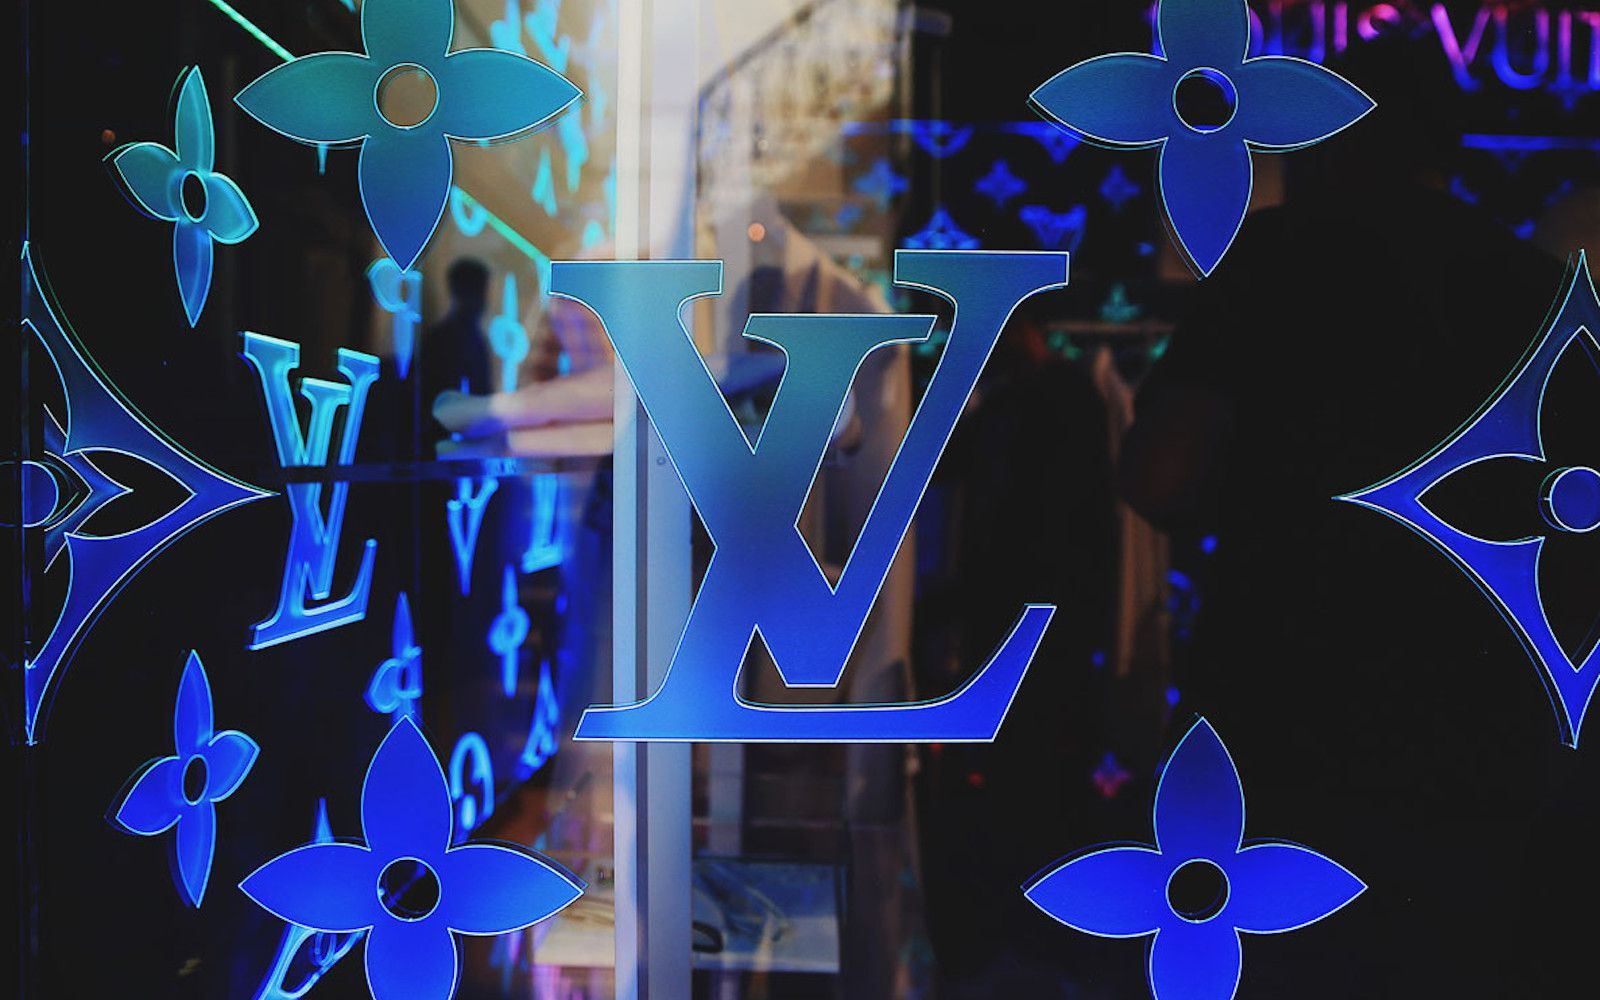 Neon Louis Vuitton Wallpapers On Wallpaperdog